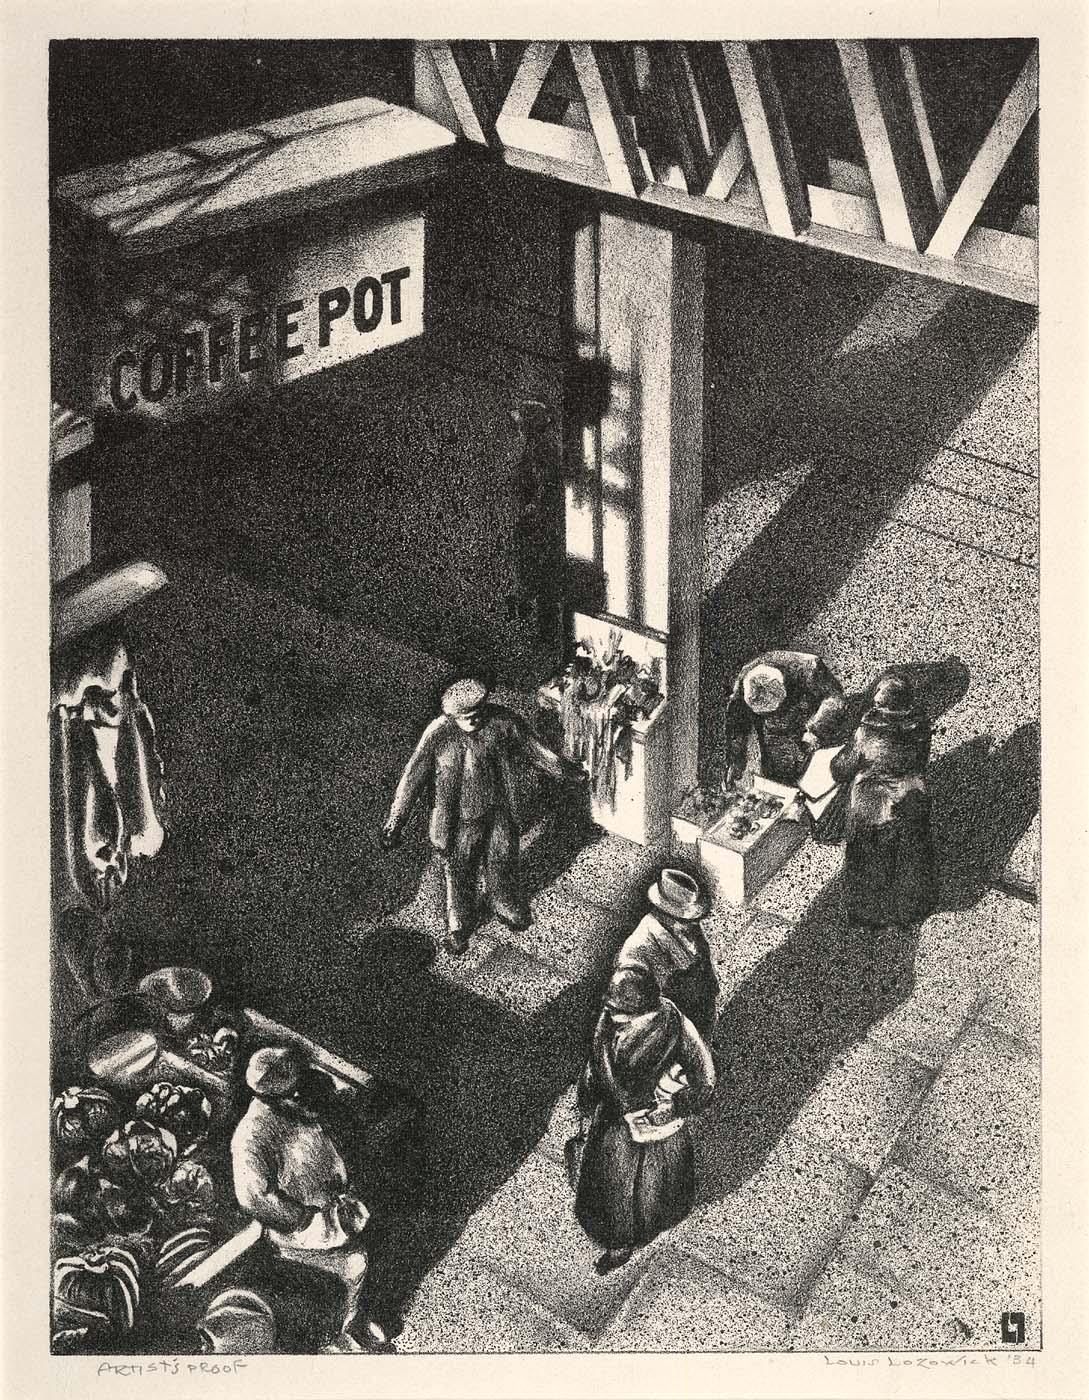 First Avenue Market (East Side Market) (Second Avenue Market) 1934